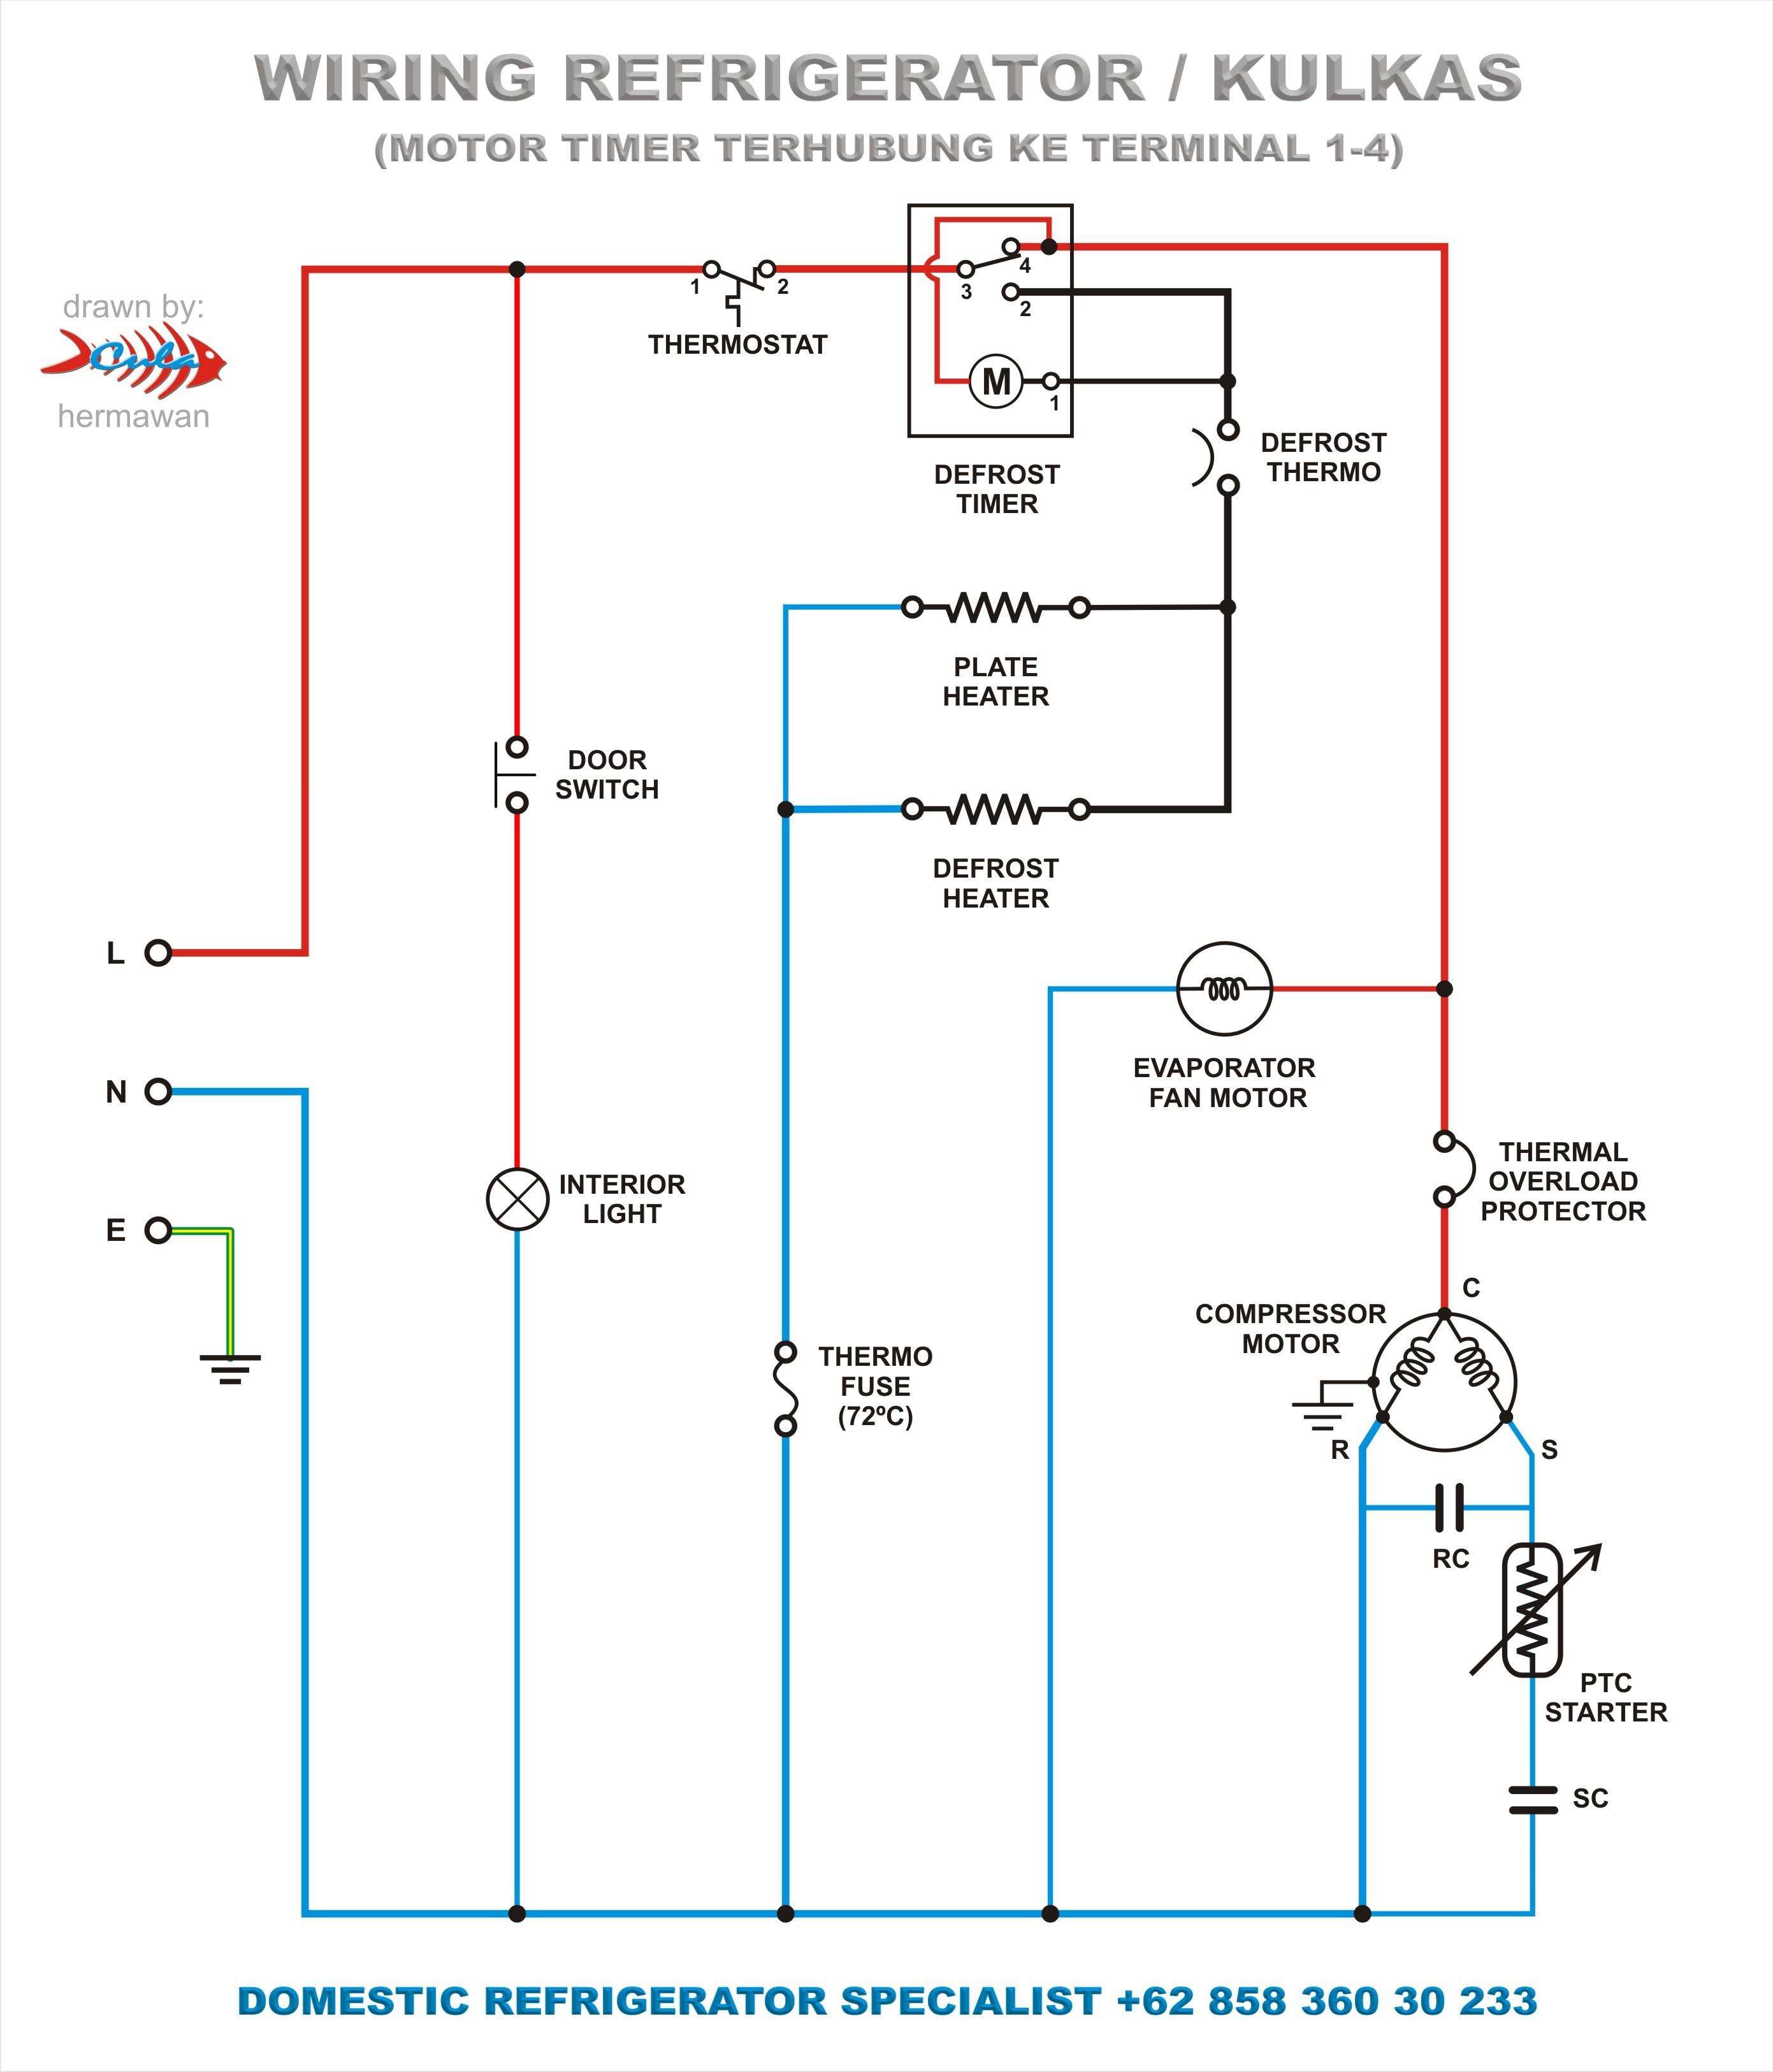 Refrigerator pressor Wiring Diagram & Refrigerator pressor Wiring Diagram New How To Wire A Refrigerator Pressor Relay Wiring Diagram